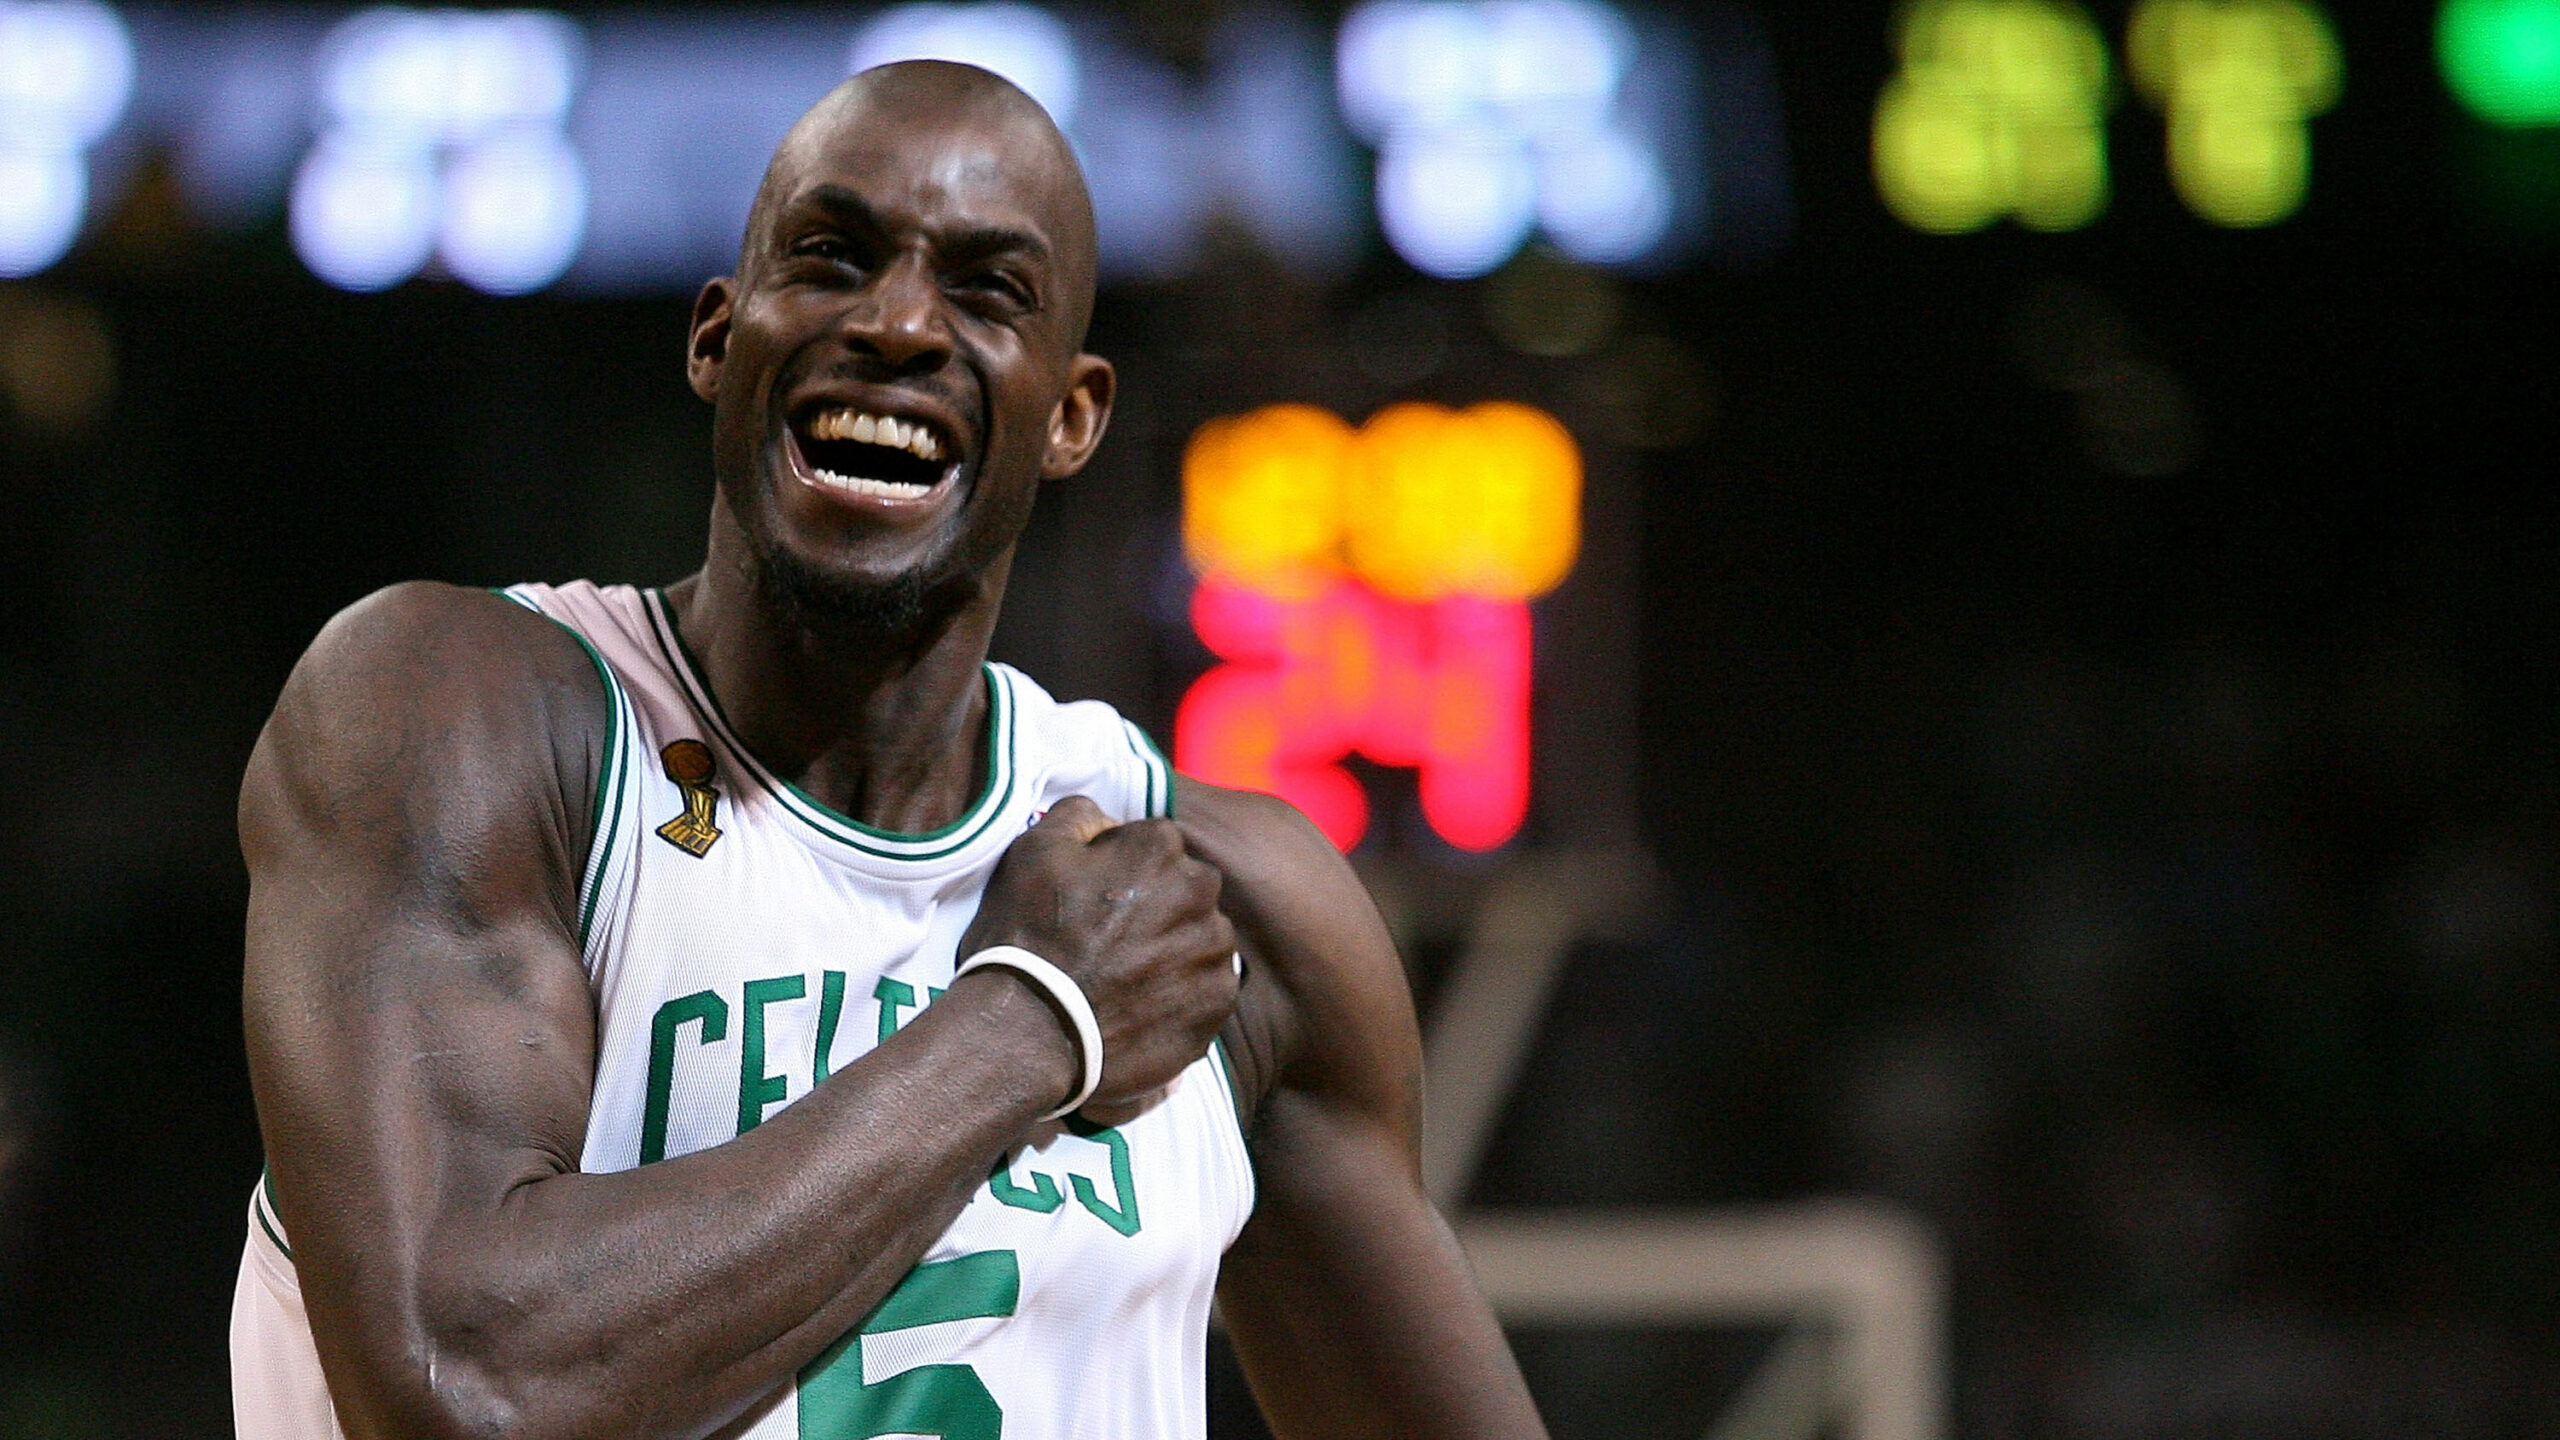 Legendary Moments In NBA History: Kevin Garnett traded to Boston Celtics in 2007